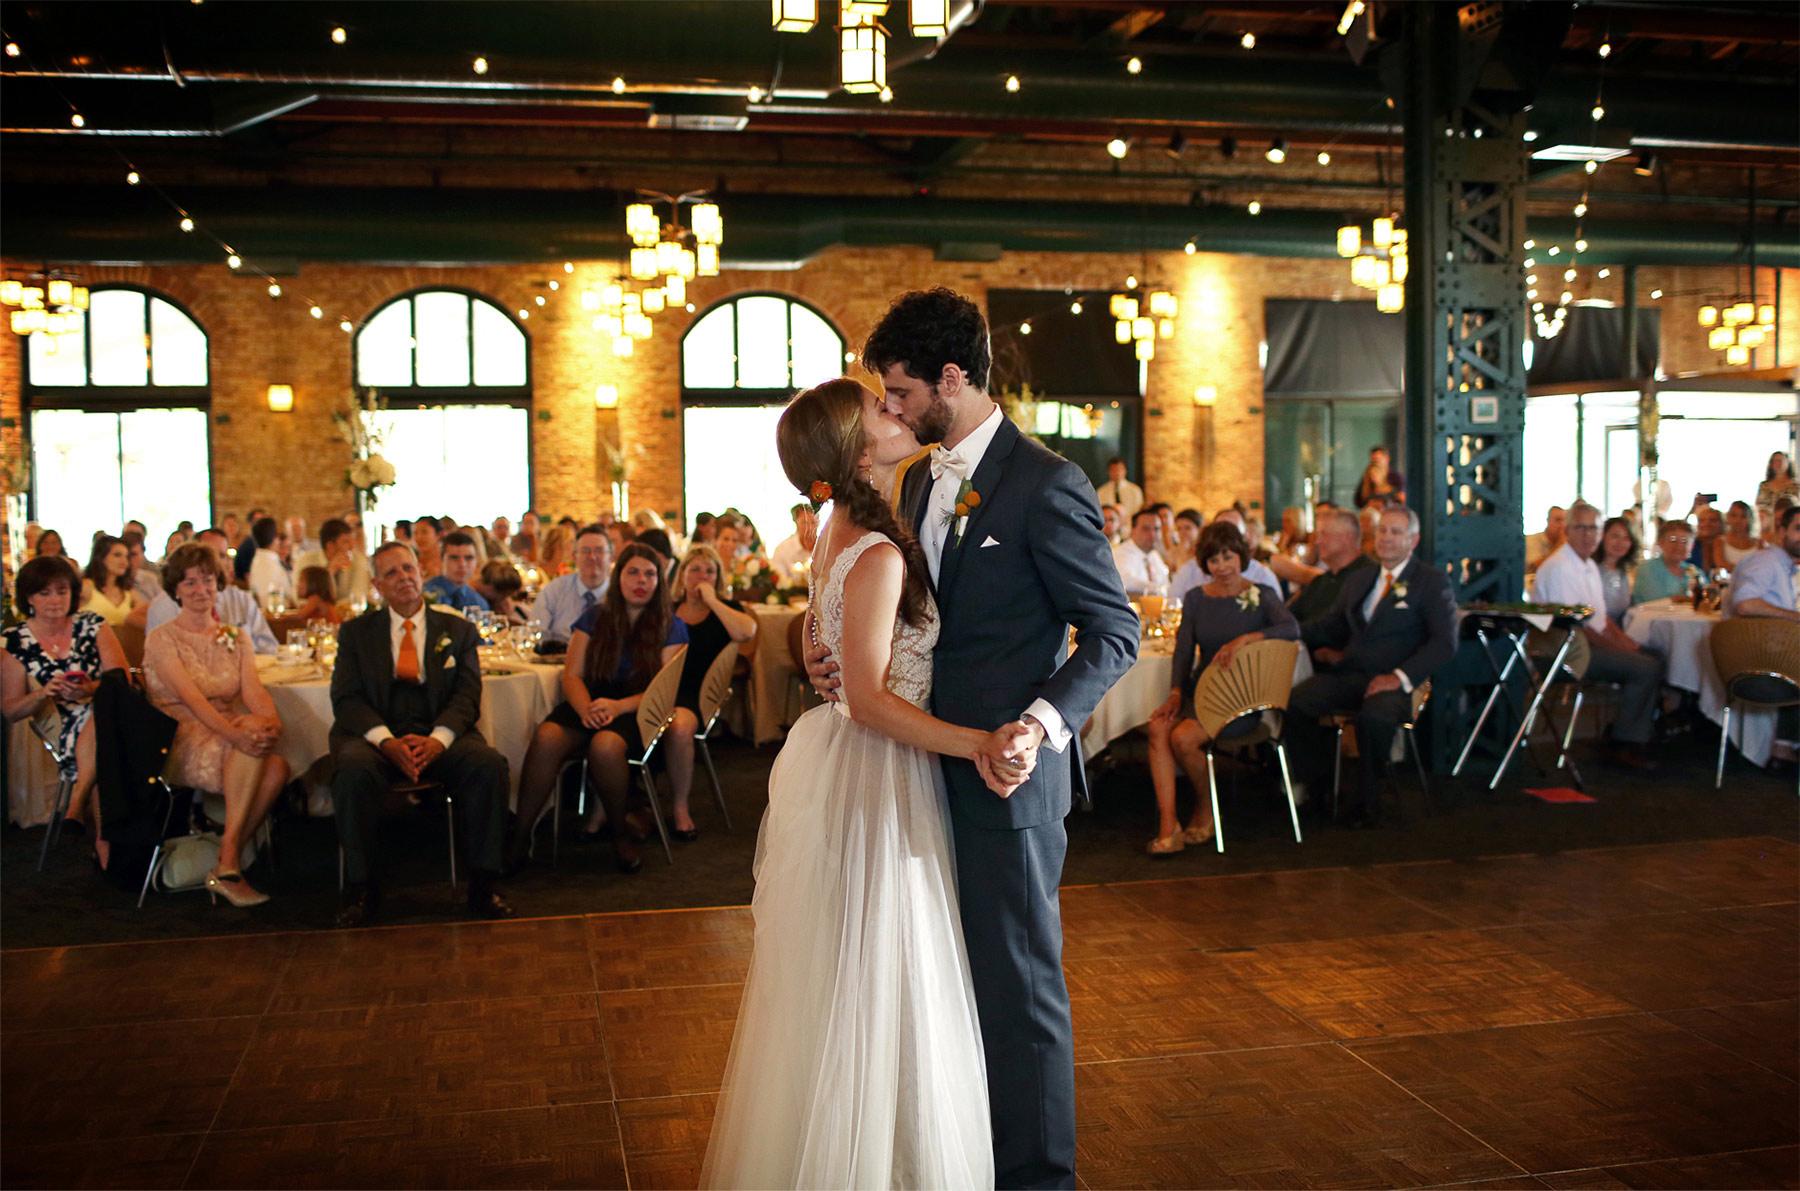 20-Minneapolis-Minnesota-Wedding-Photography-by-Vick-Photography-Downtown-Reception-Nicollet-Island-Pavillion-First-Dance-Sarah-&-Tom.jpg